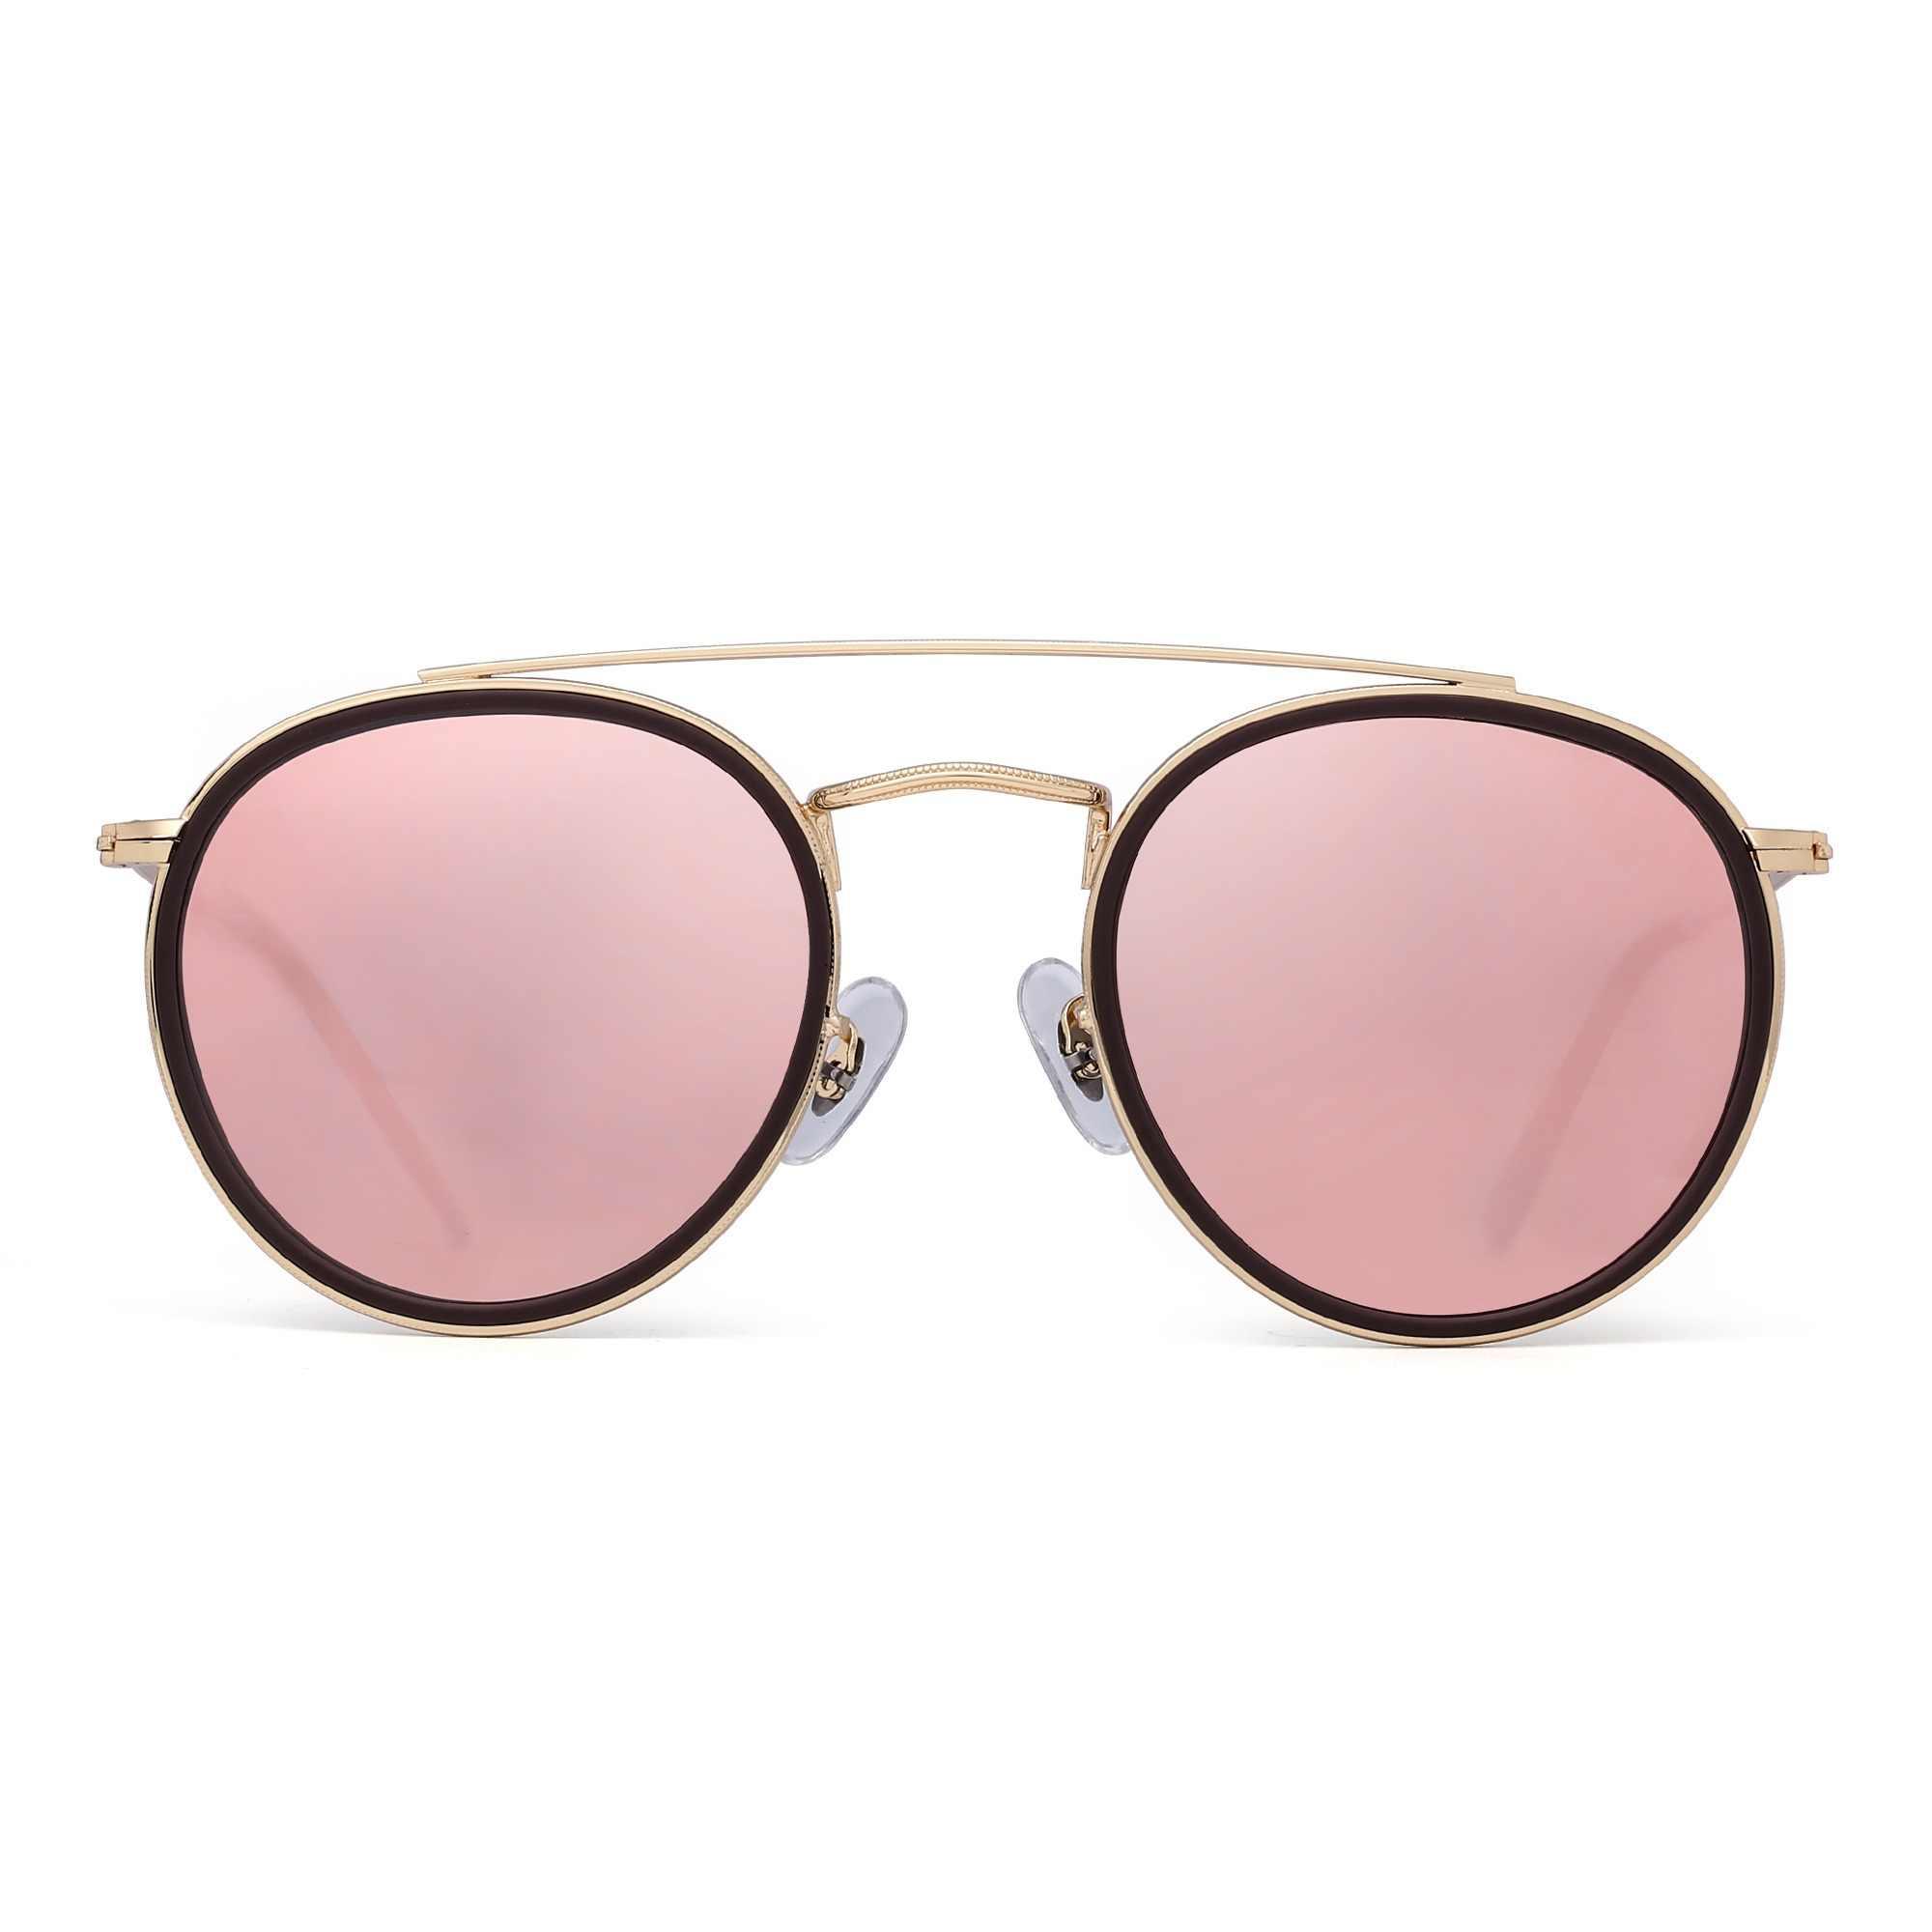 e0892ffb64 Jim Halo Round Polarized Sunglasses Metal Frame Mirrored Flat Circle Lens  Men Women Retro Vintage Oculos